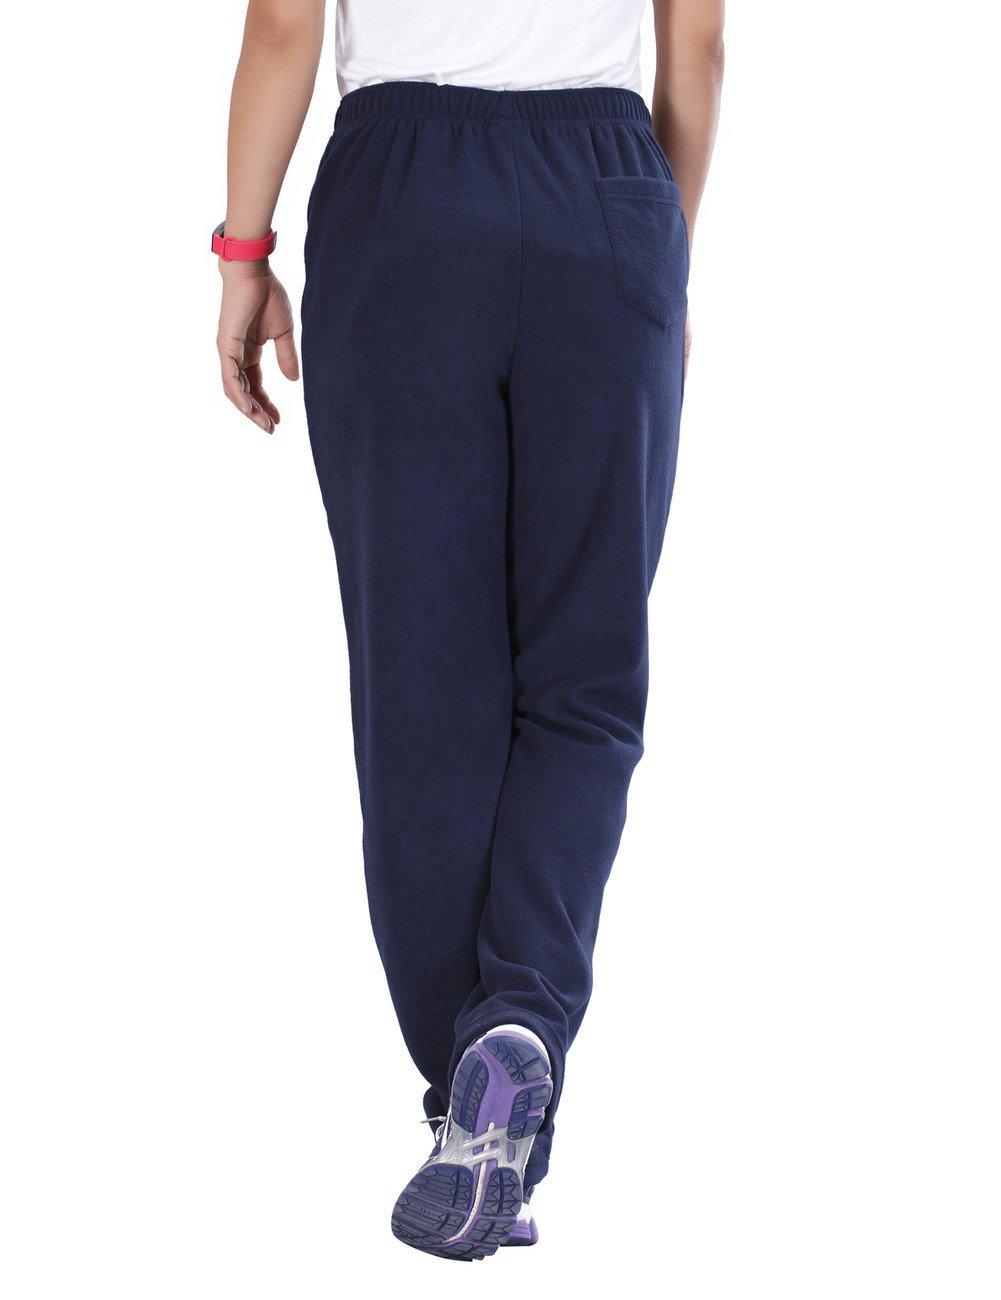 Nonwe Womens Outdoors Casual Fleece Hiking Sweat Pants